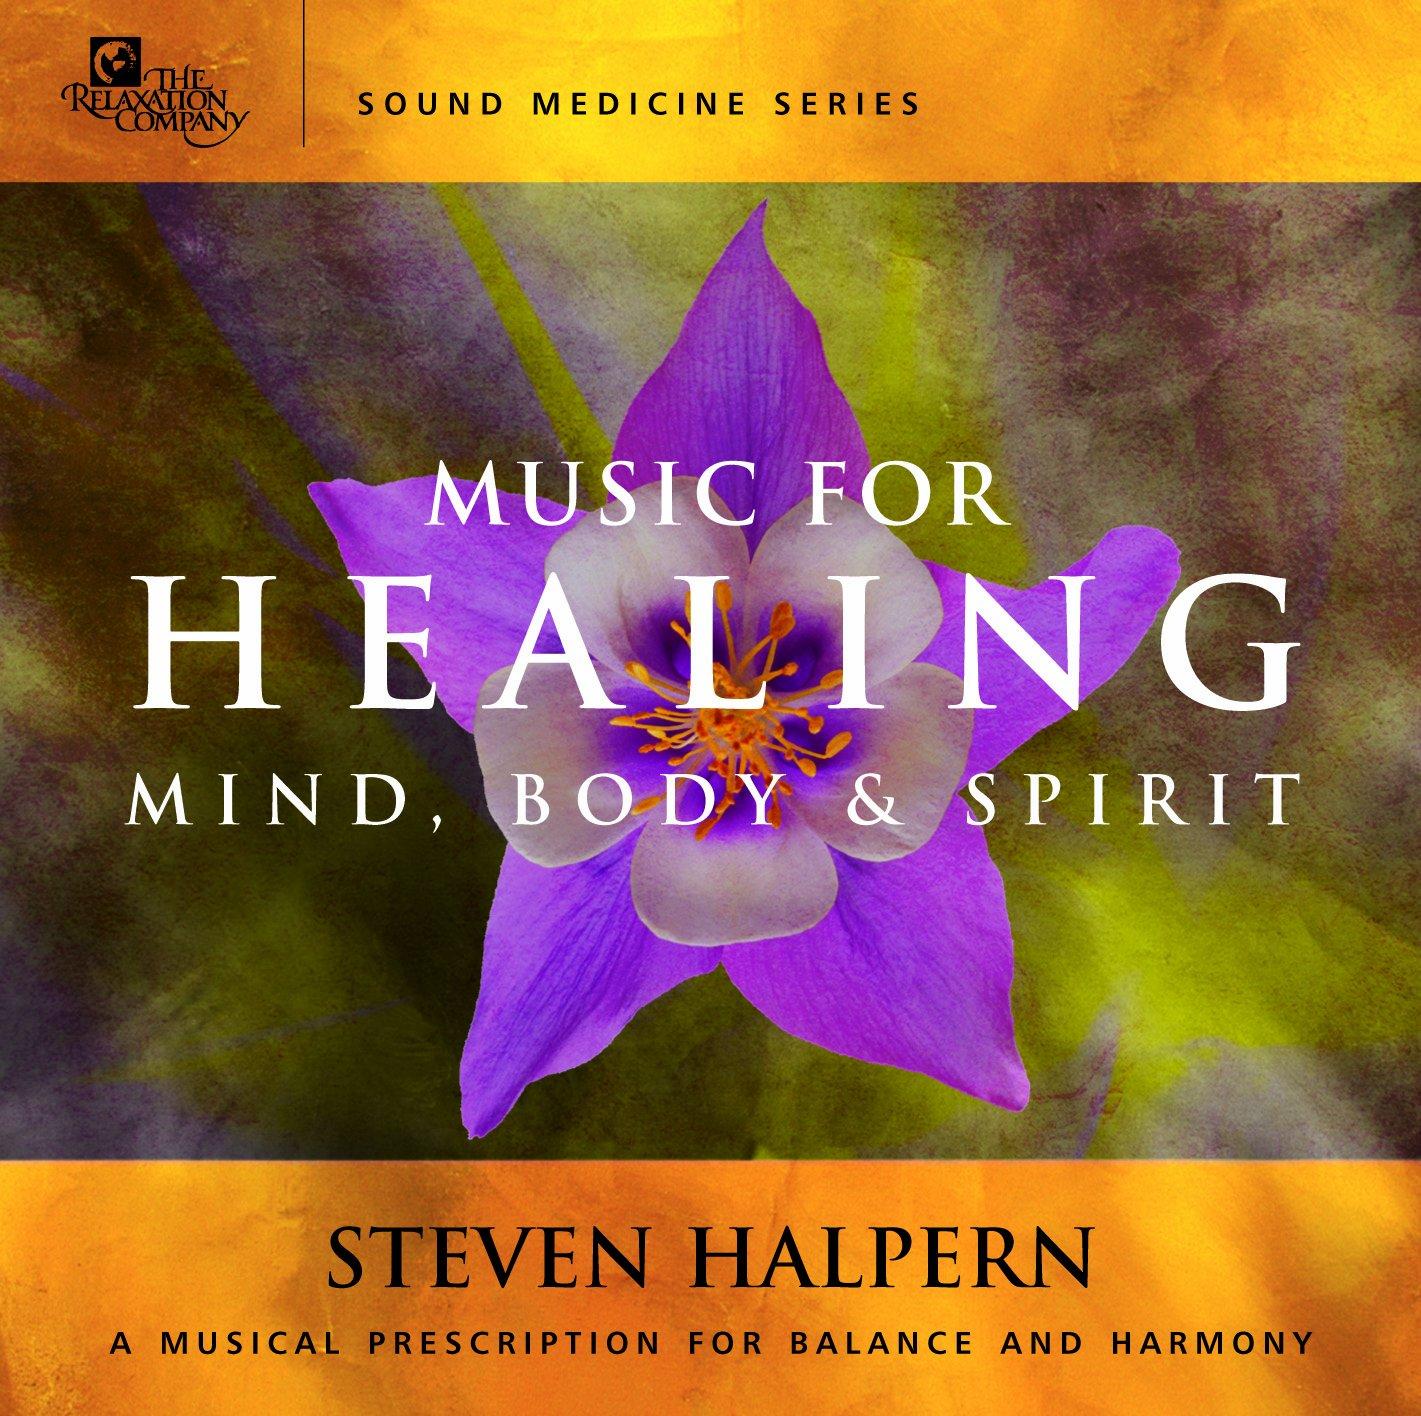 Stephen Halpern